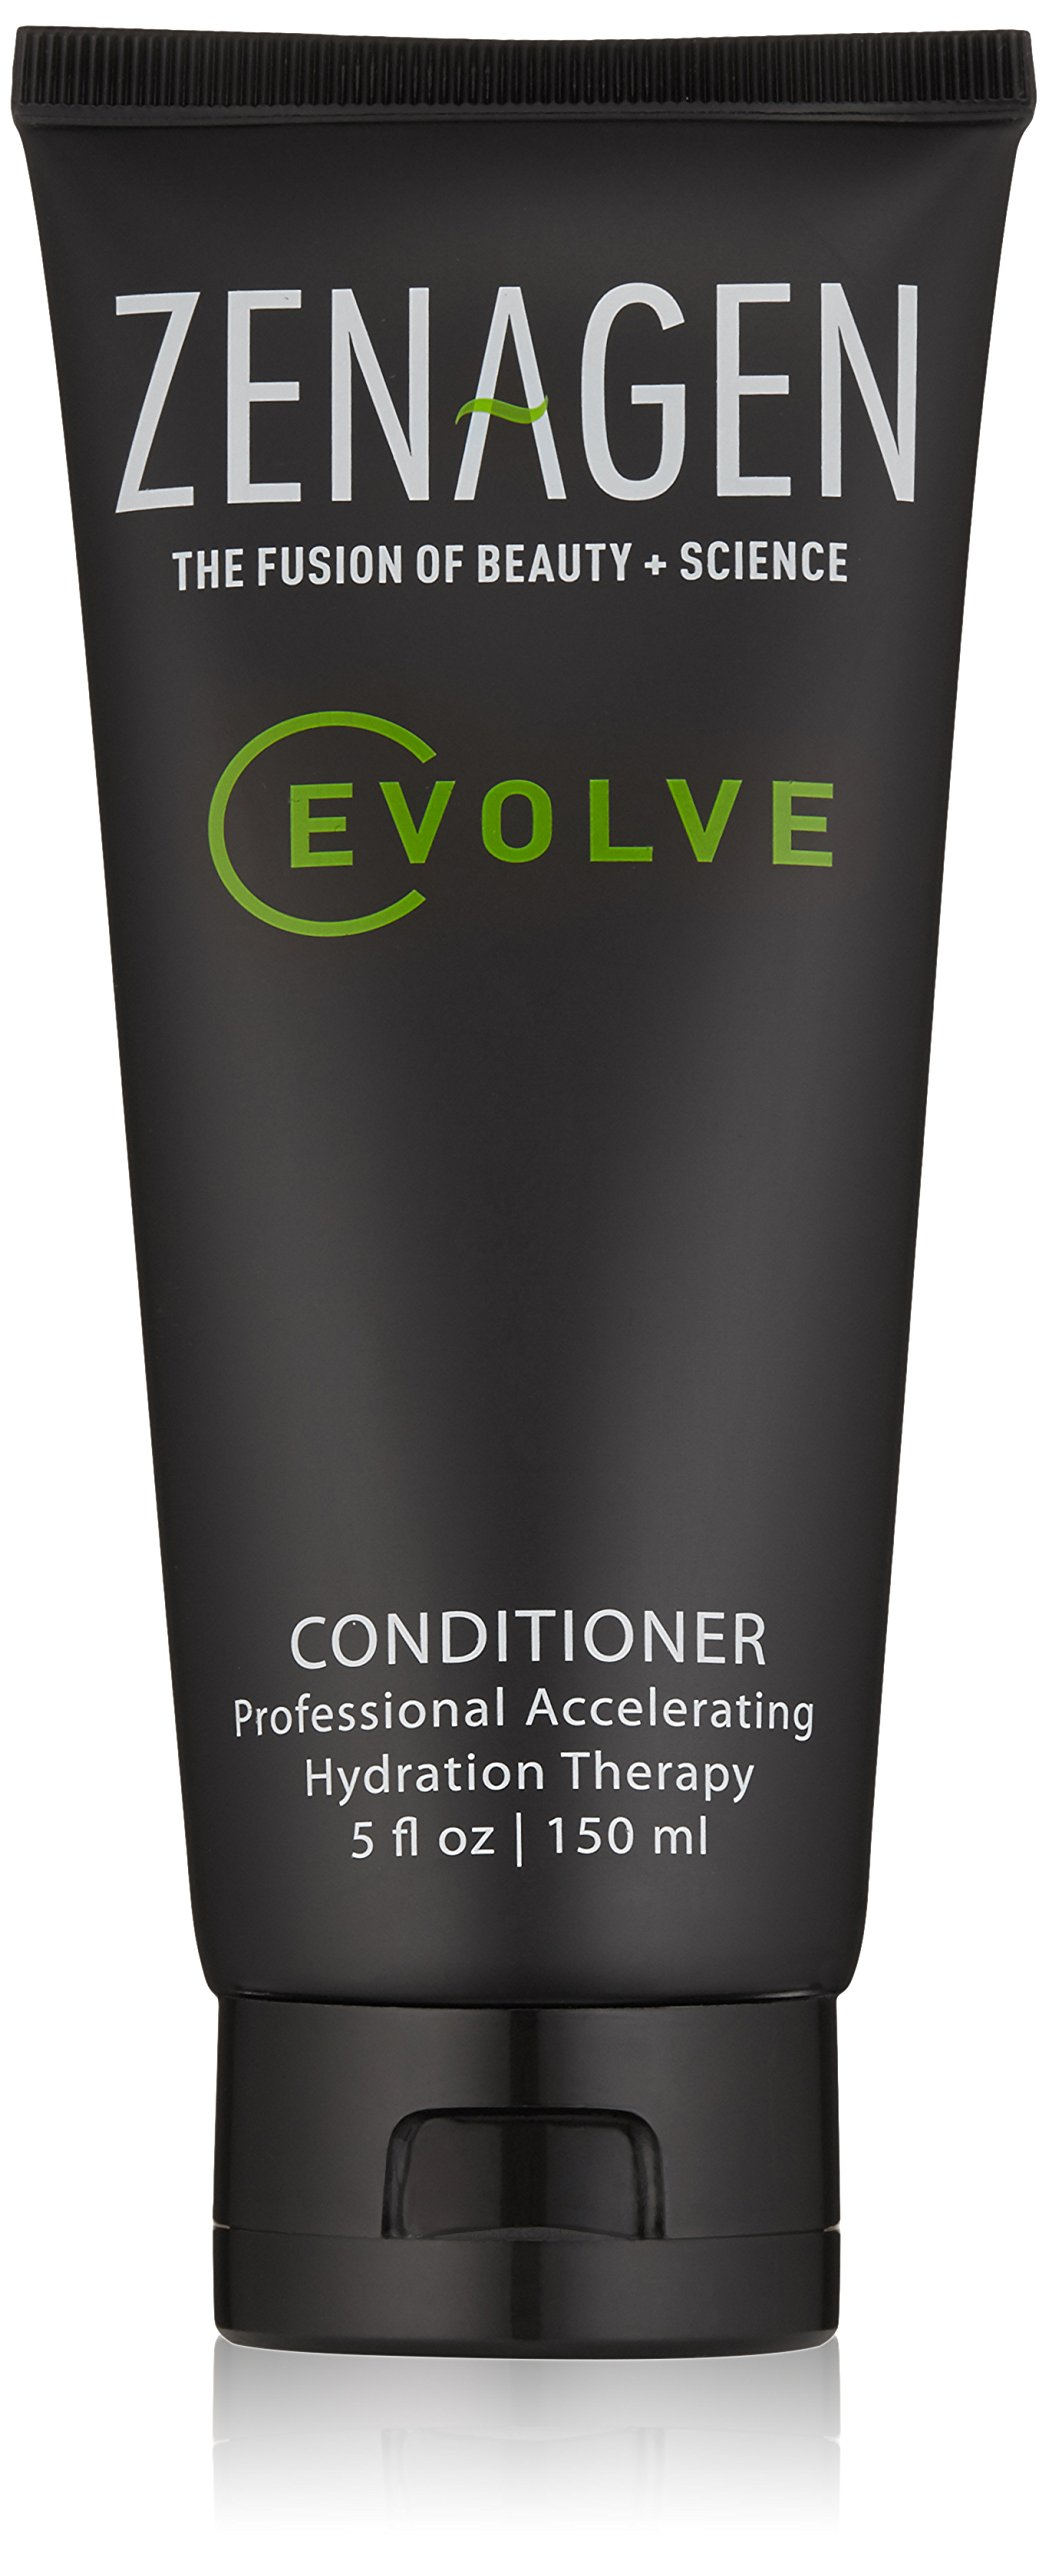 Zenagen Evolve Professional Accelerating Conditioner, 5 oz.